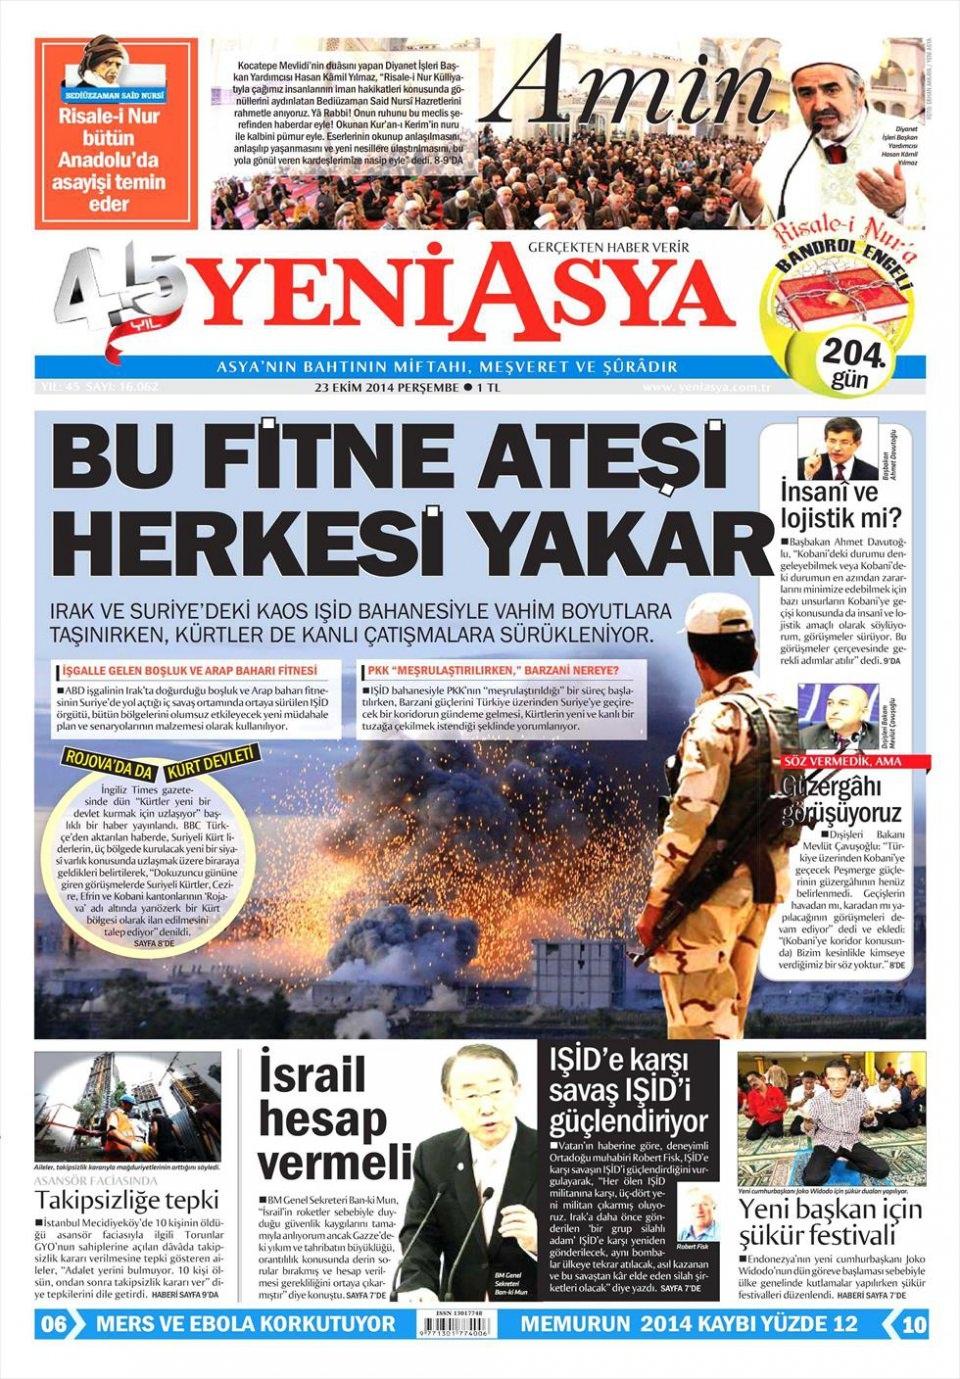 23 Ekim 2014 gazete manşetleri 22